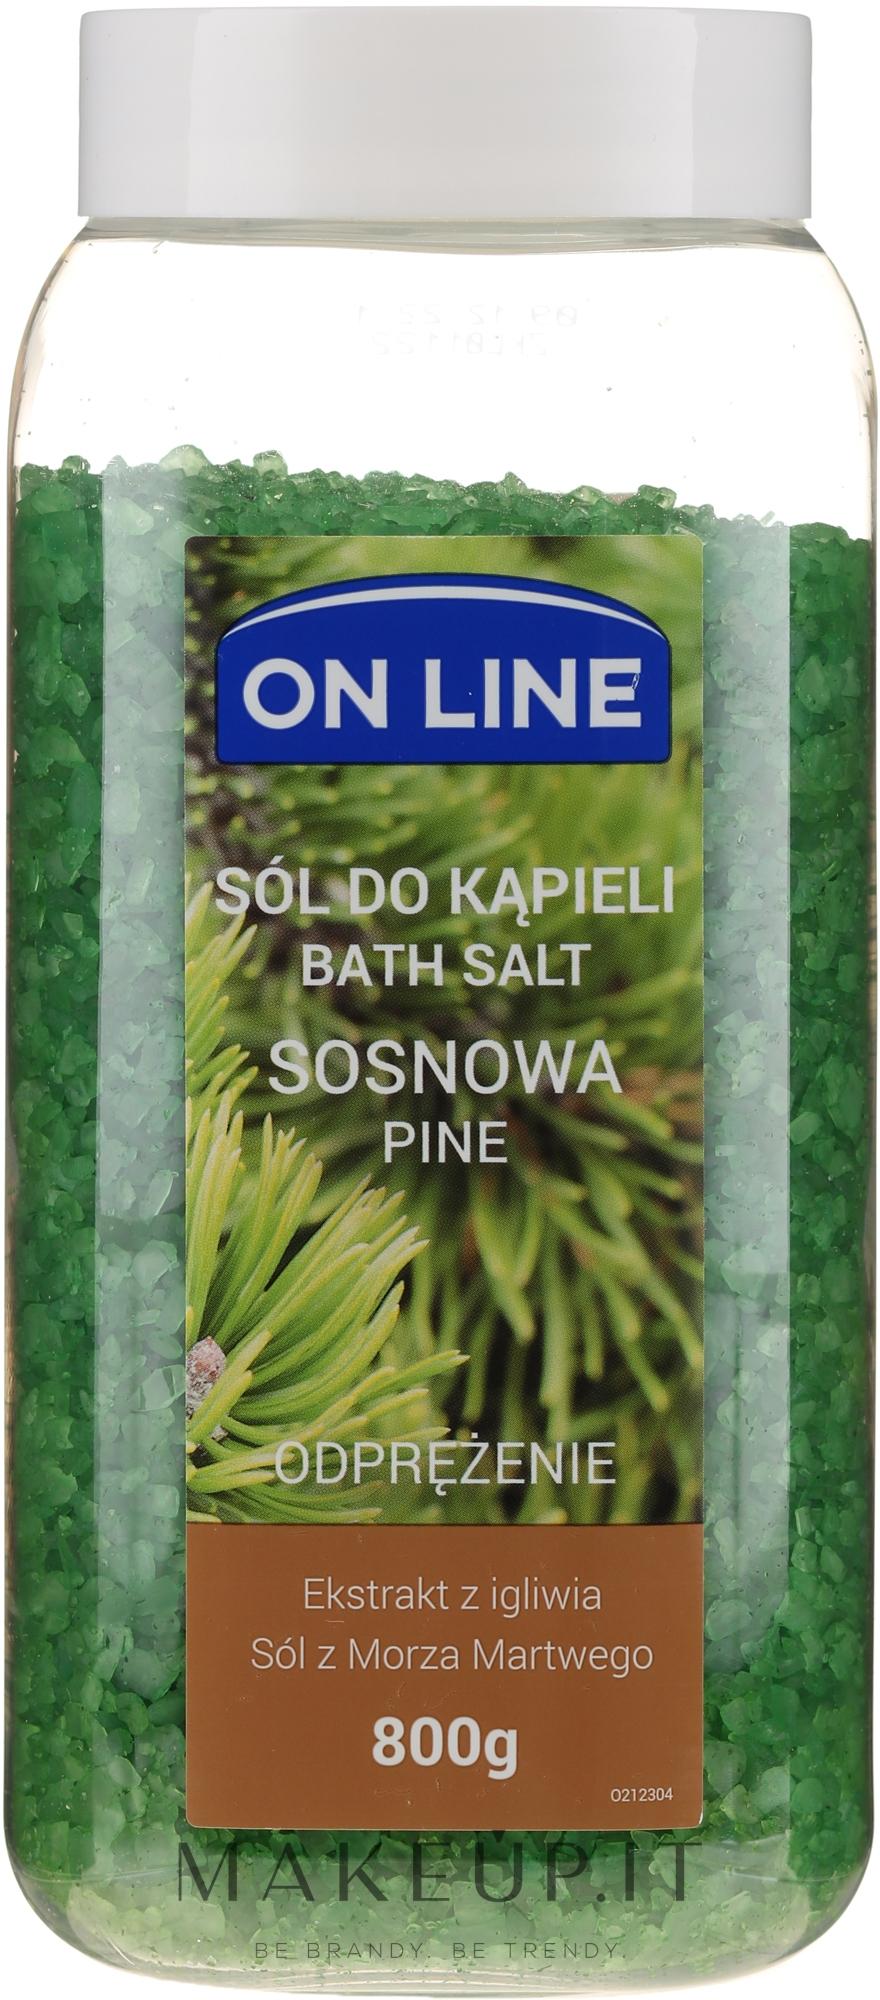 "Sale da bagno ""Pino"" - On Line Pine Tree Bath Salt — foto 800 g"